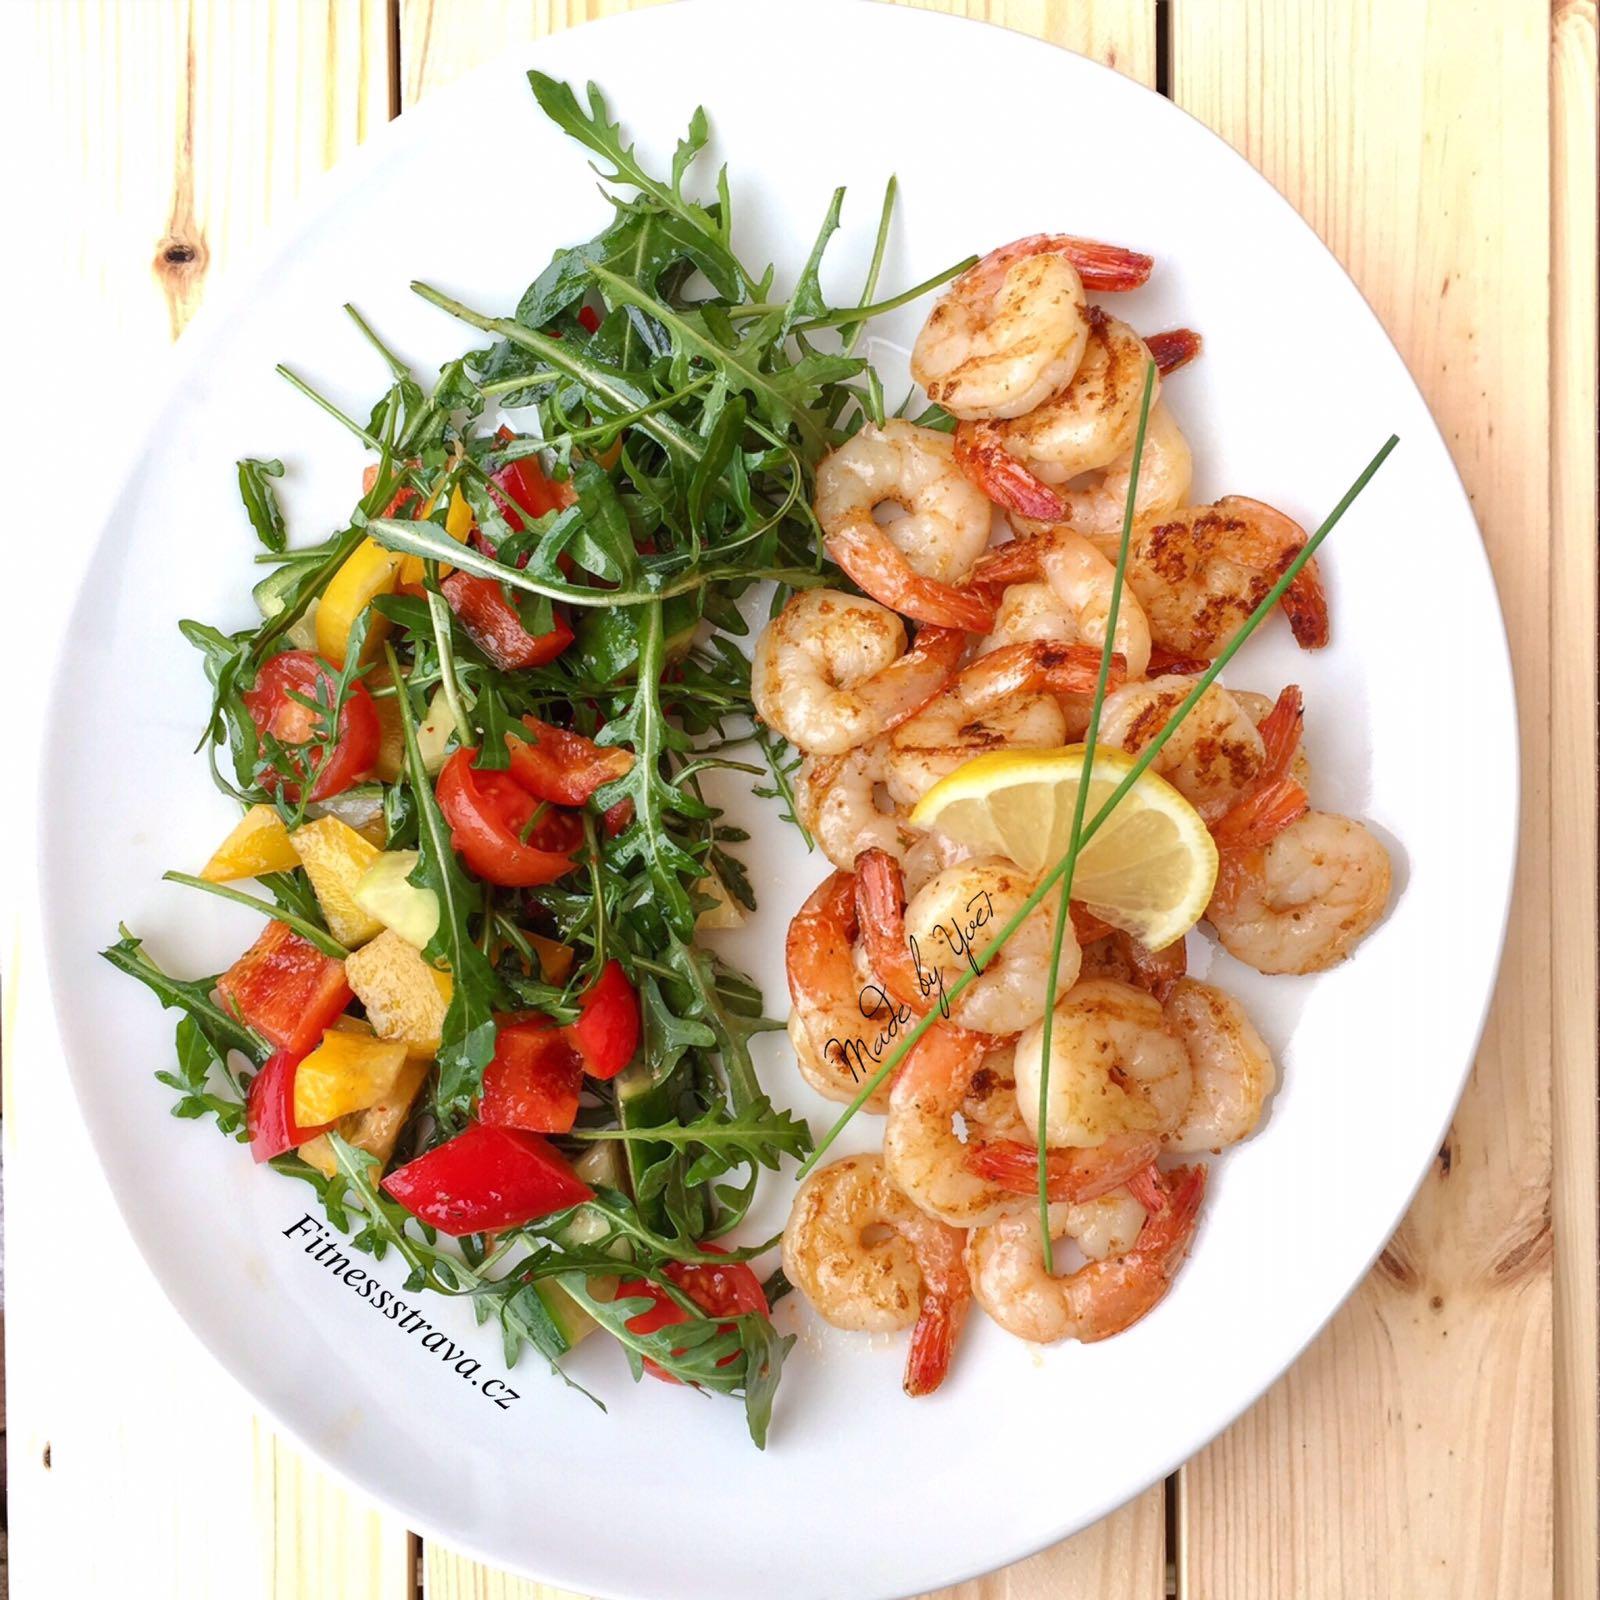 Limetkové krevety se sezamovým salátem restované na pánvi.